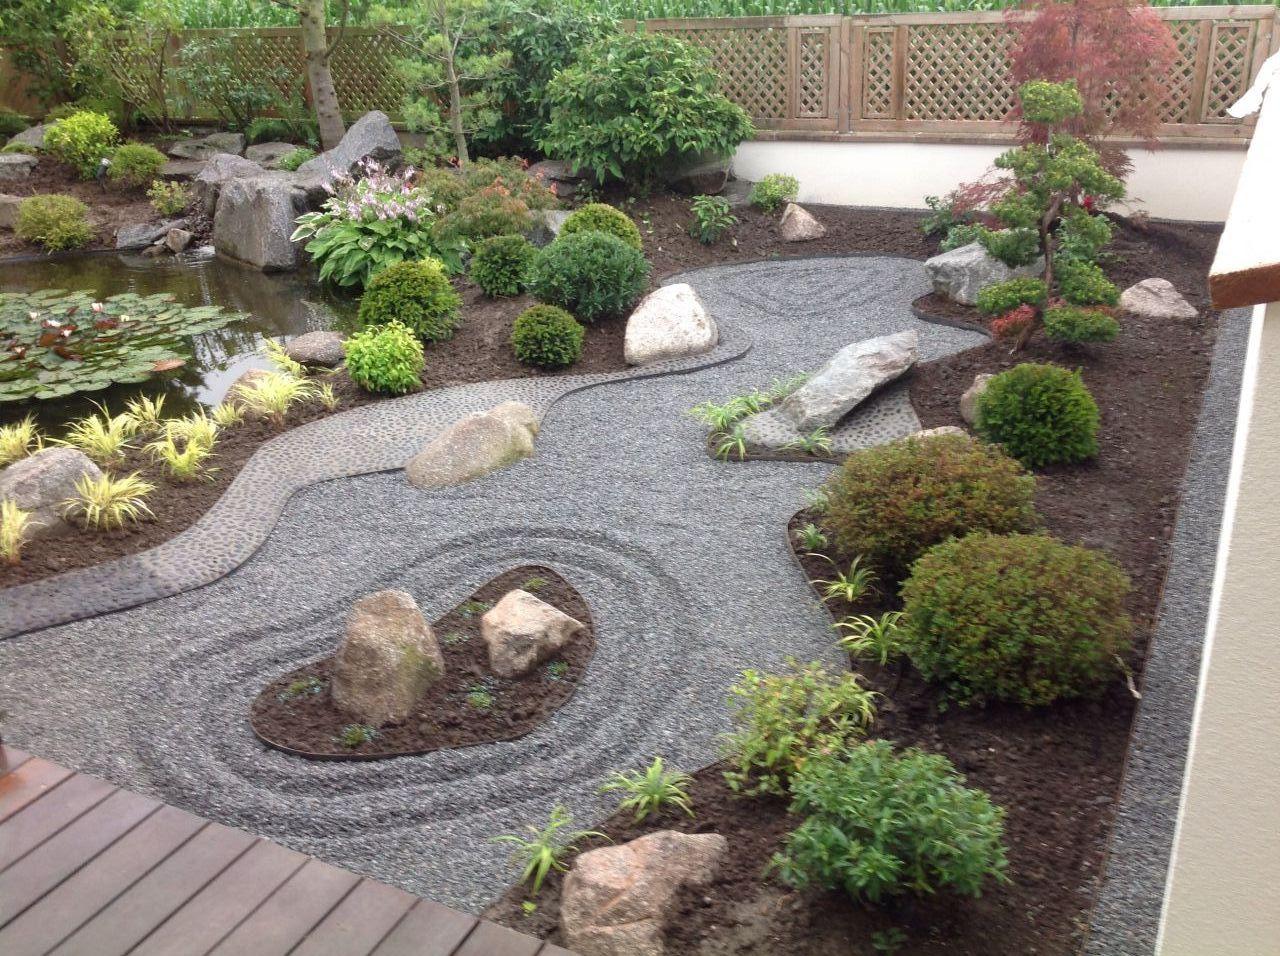 Jardin japonisant zen termin haut rhin for Petit jardin japonisant